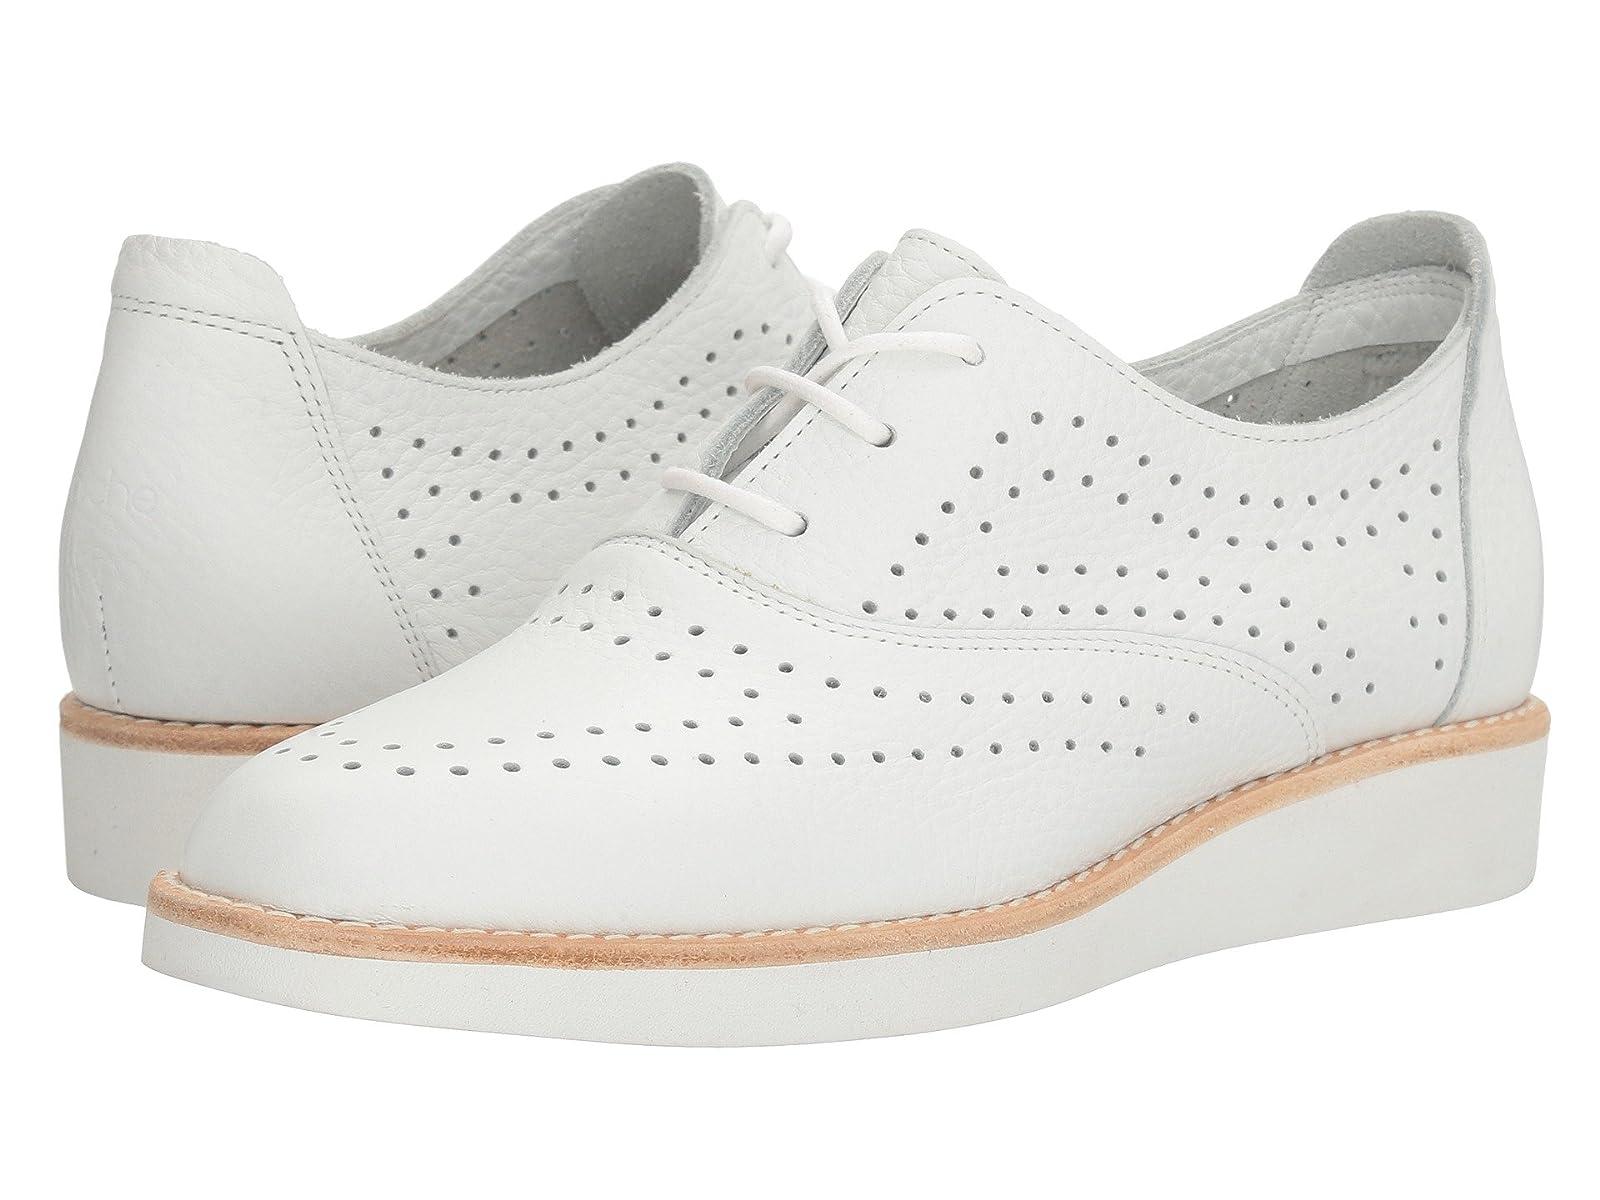 Arche DansaoCheap and distinctive eye-catching shoes